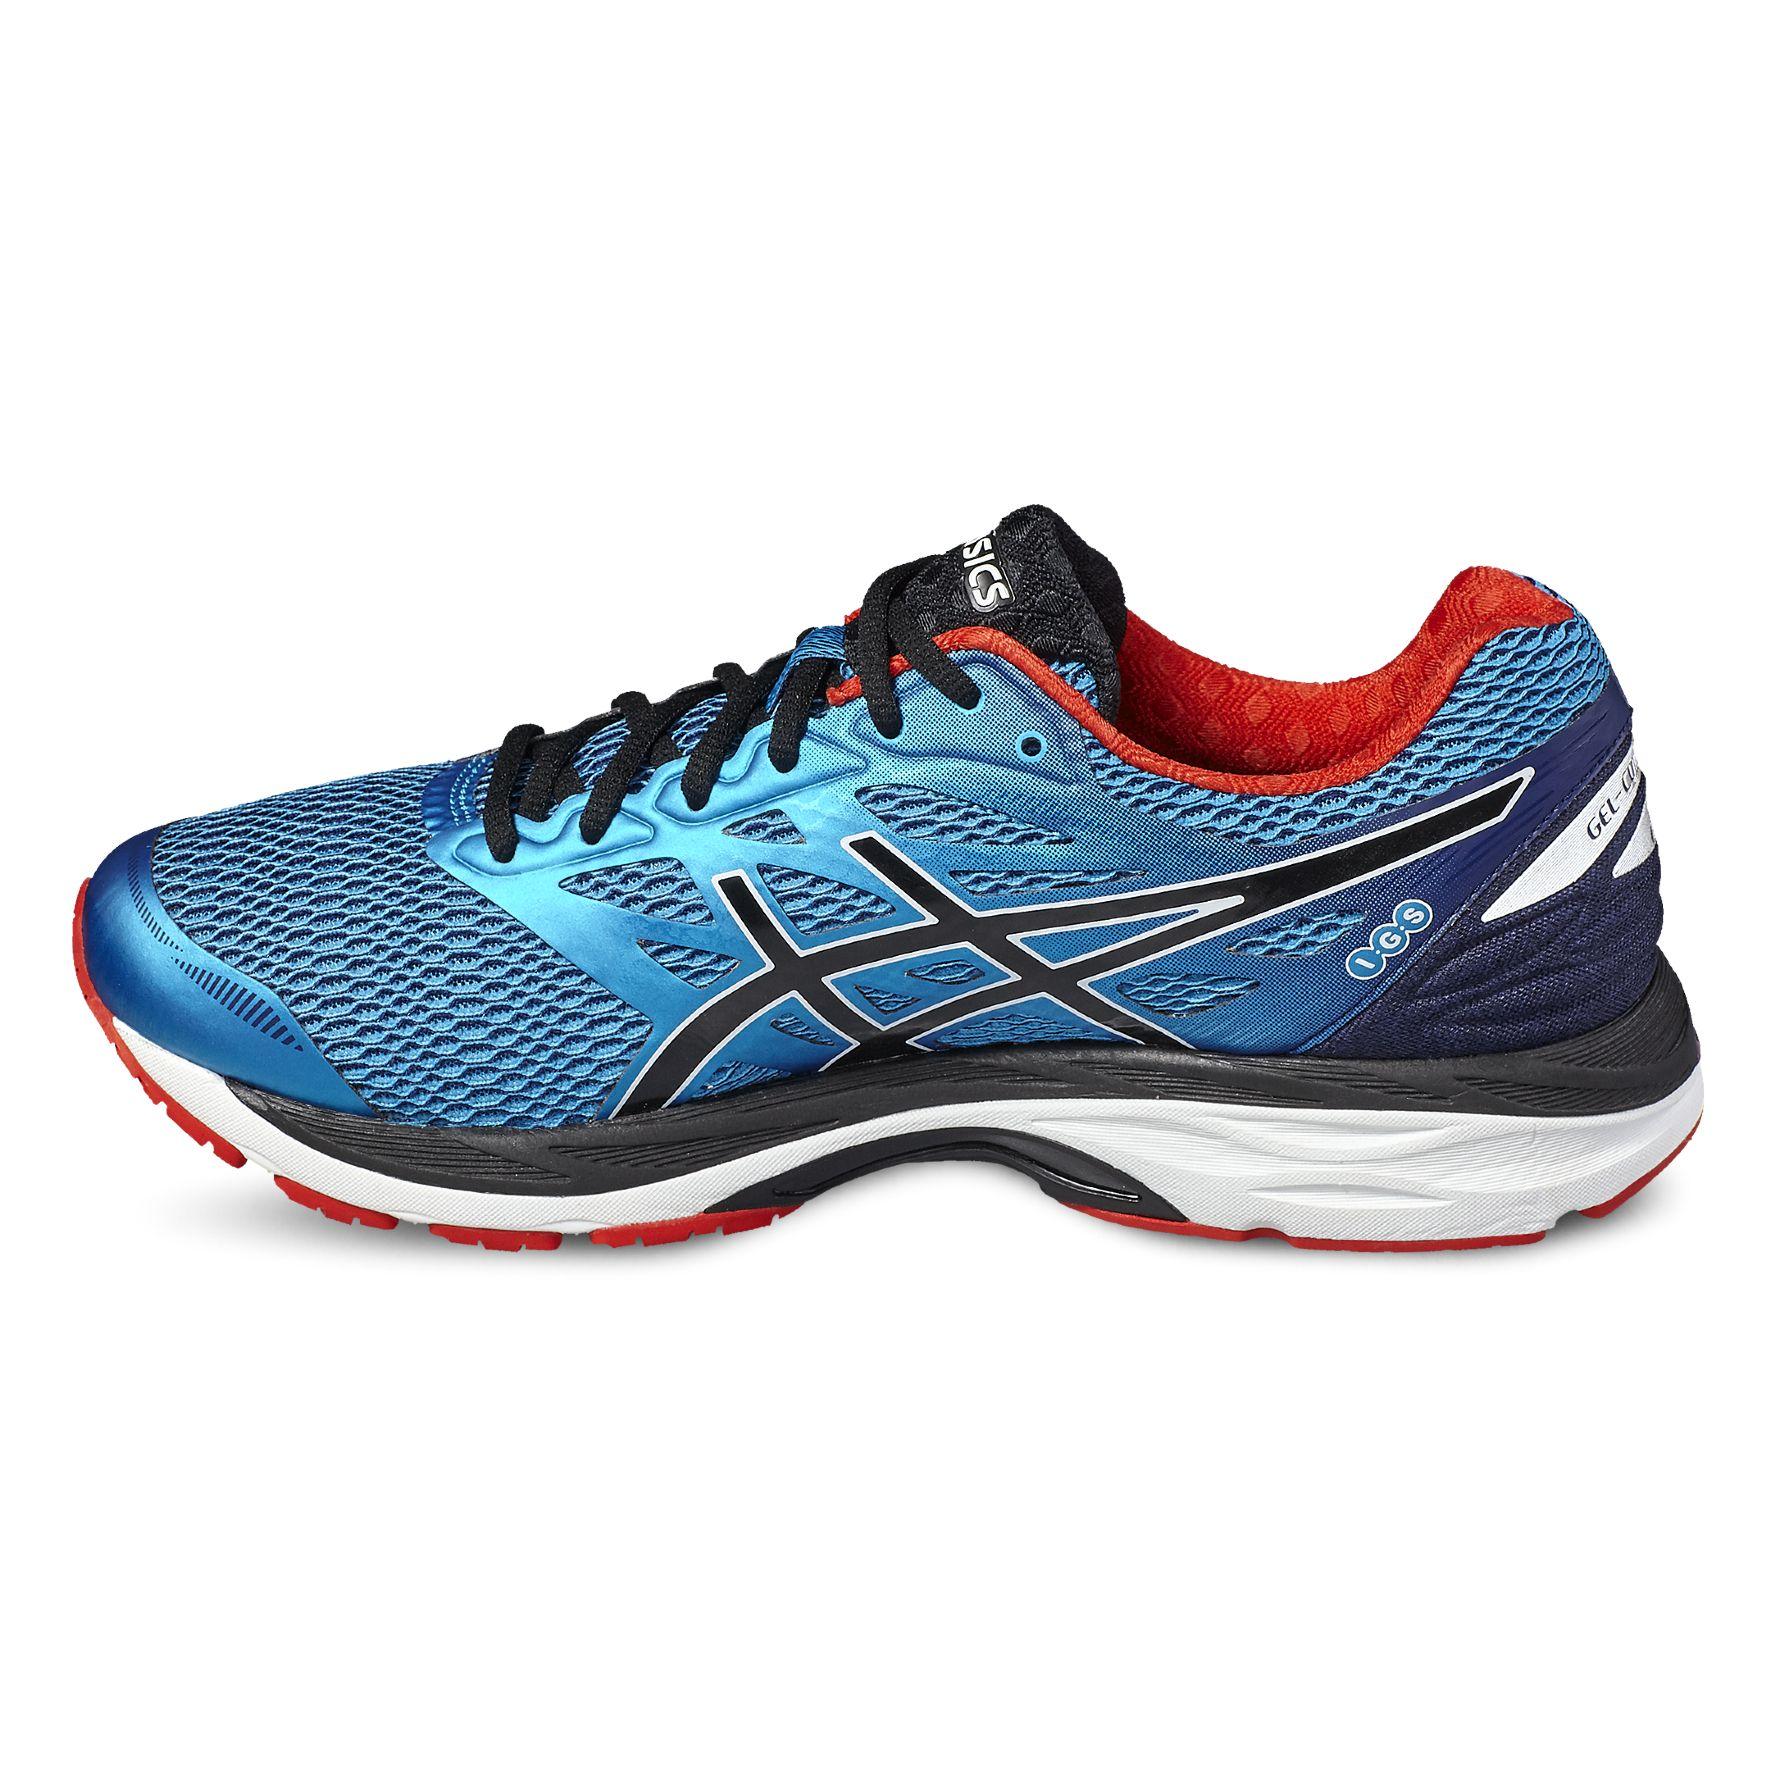 Asics Gel Cumulus  Running Shoes Review